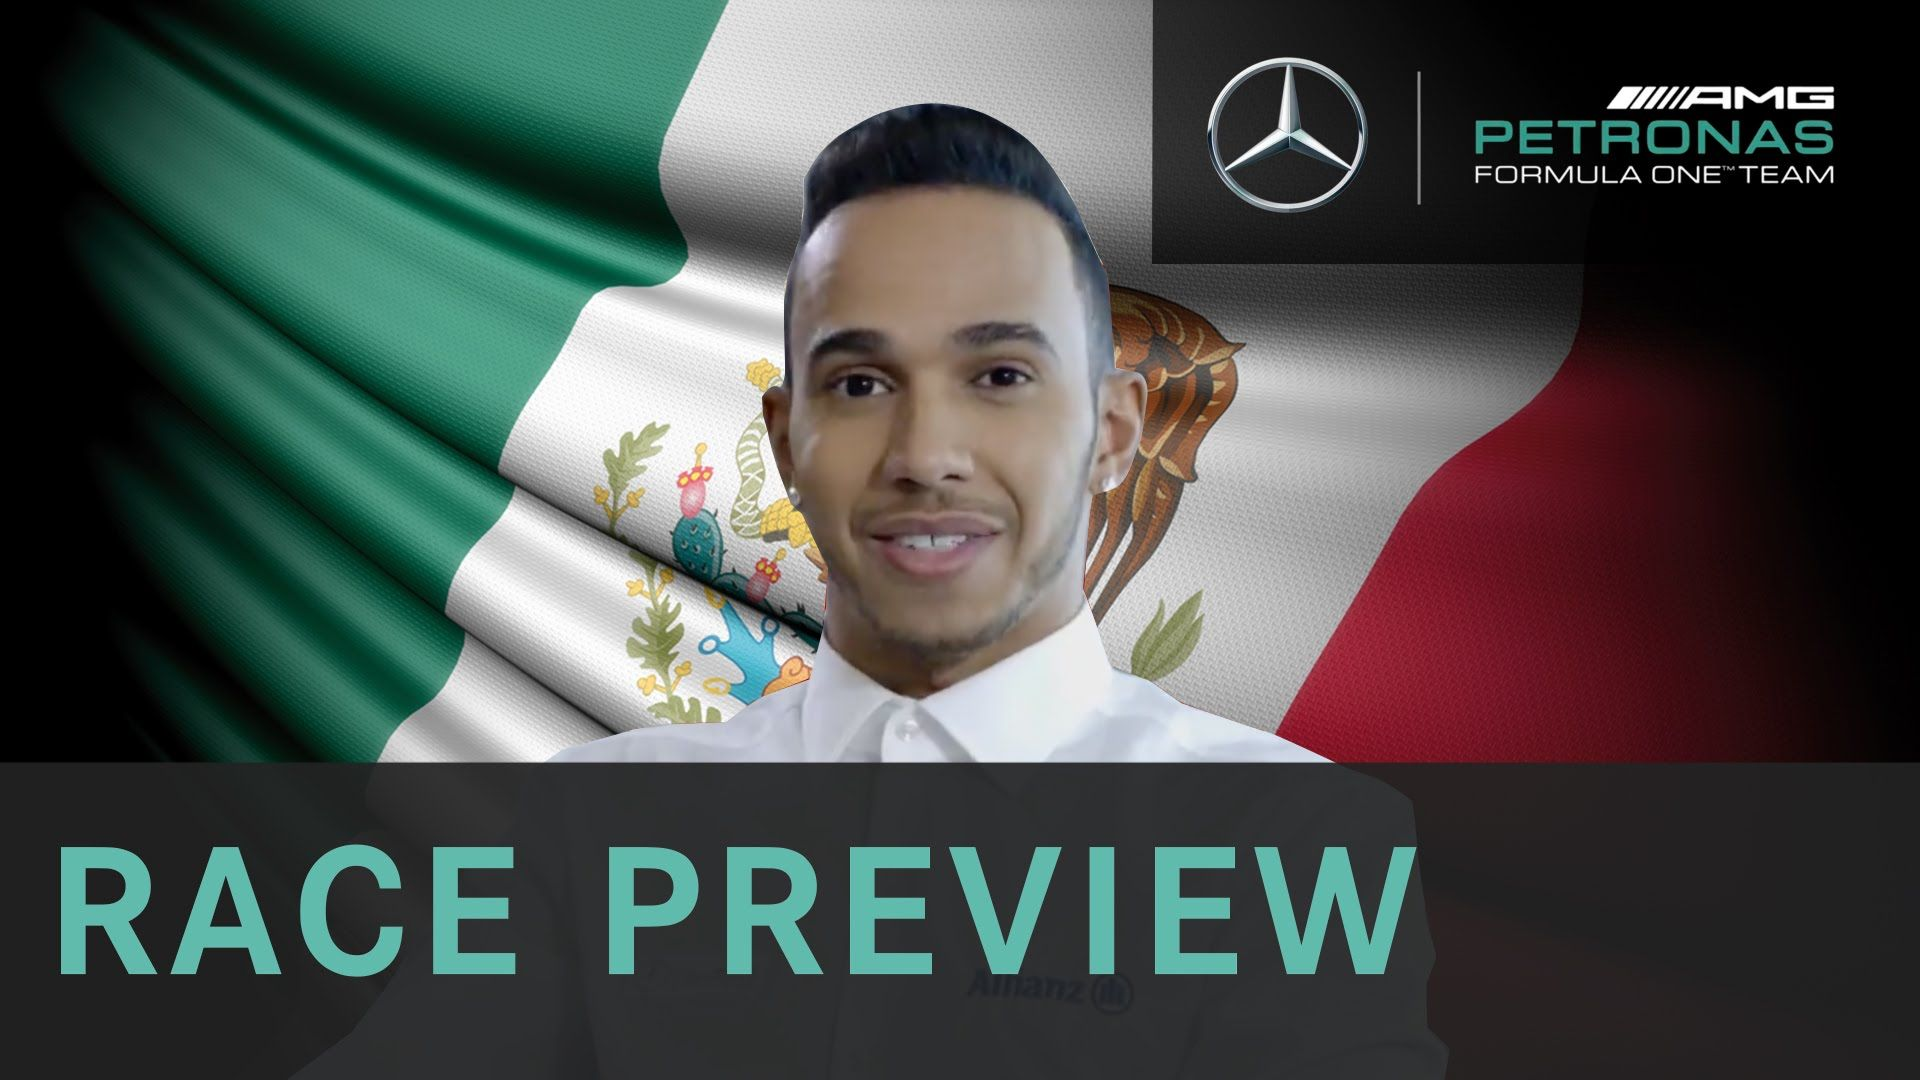 Lewis Hamilton 2015 Mexican Grand Prix F1 Preview with Allianz